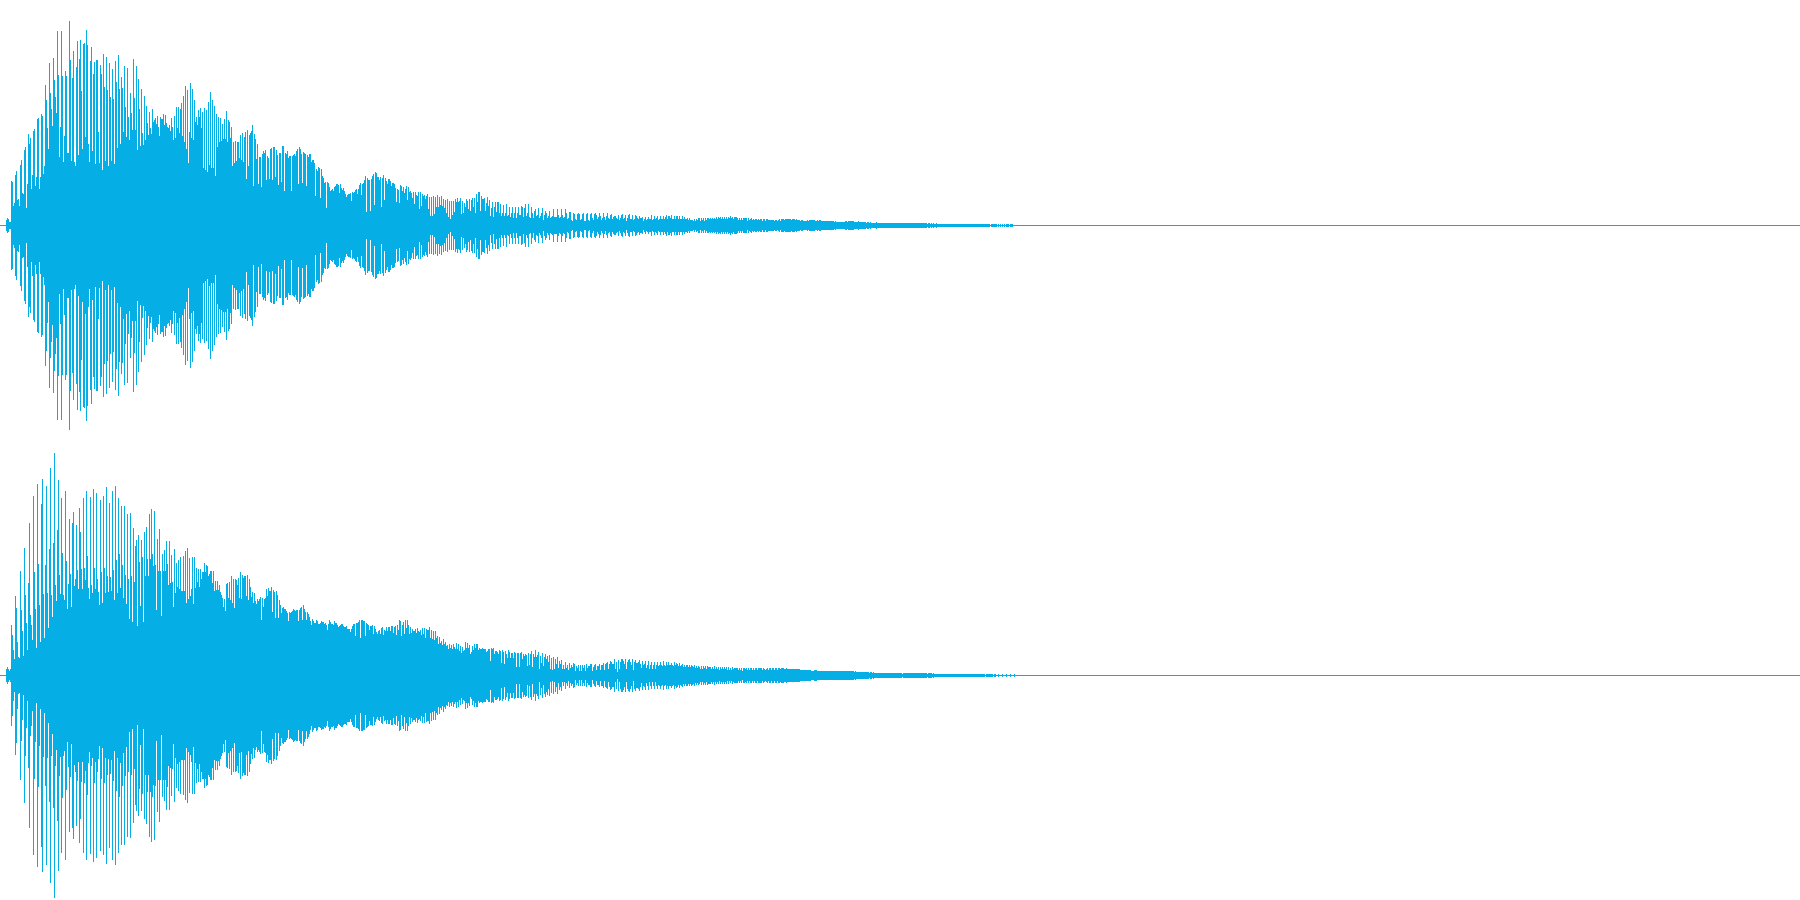 Anime そそくさと逃げる音 コミカルの再生済みの波形